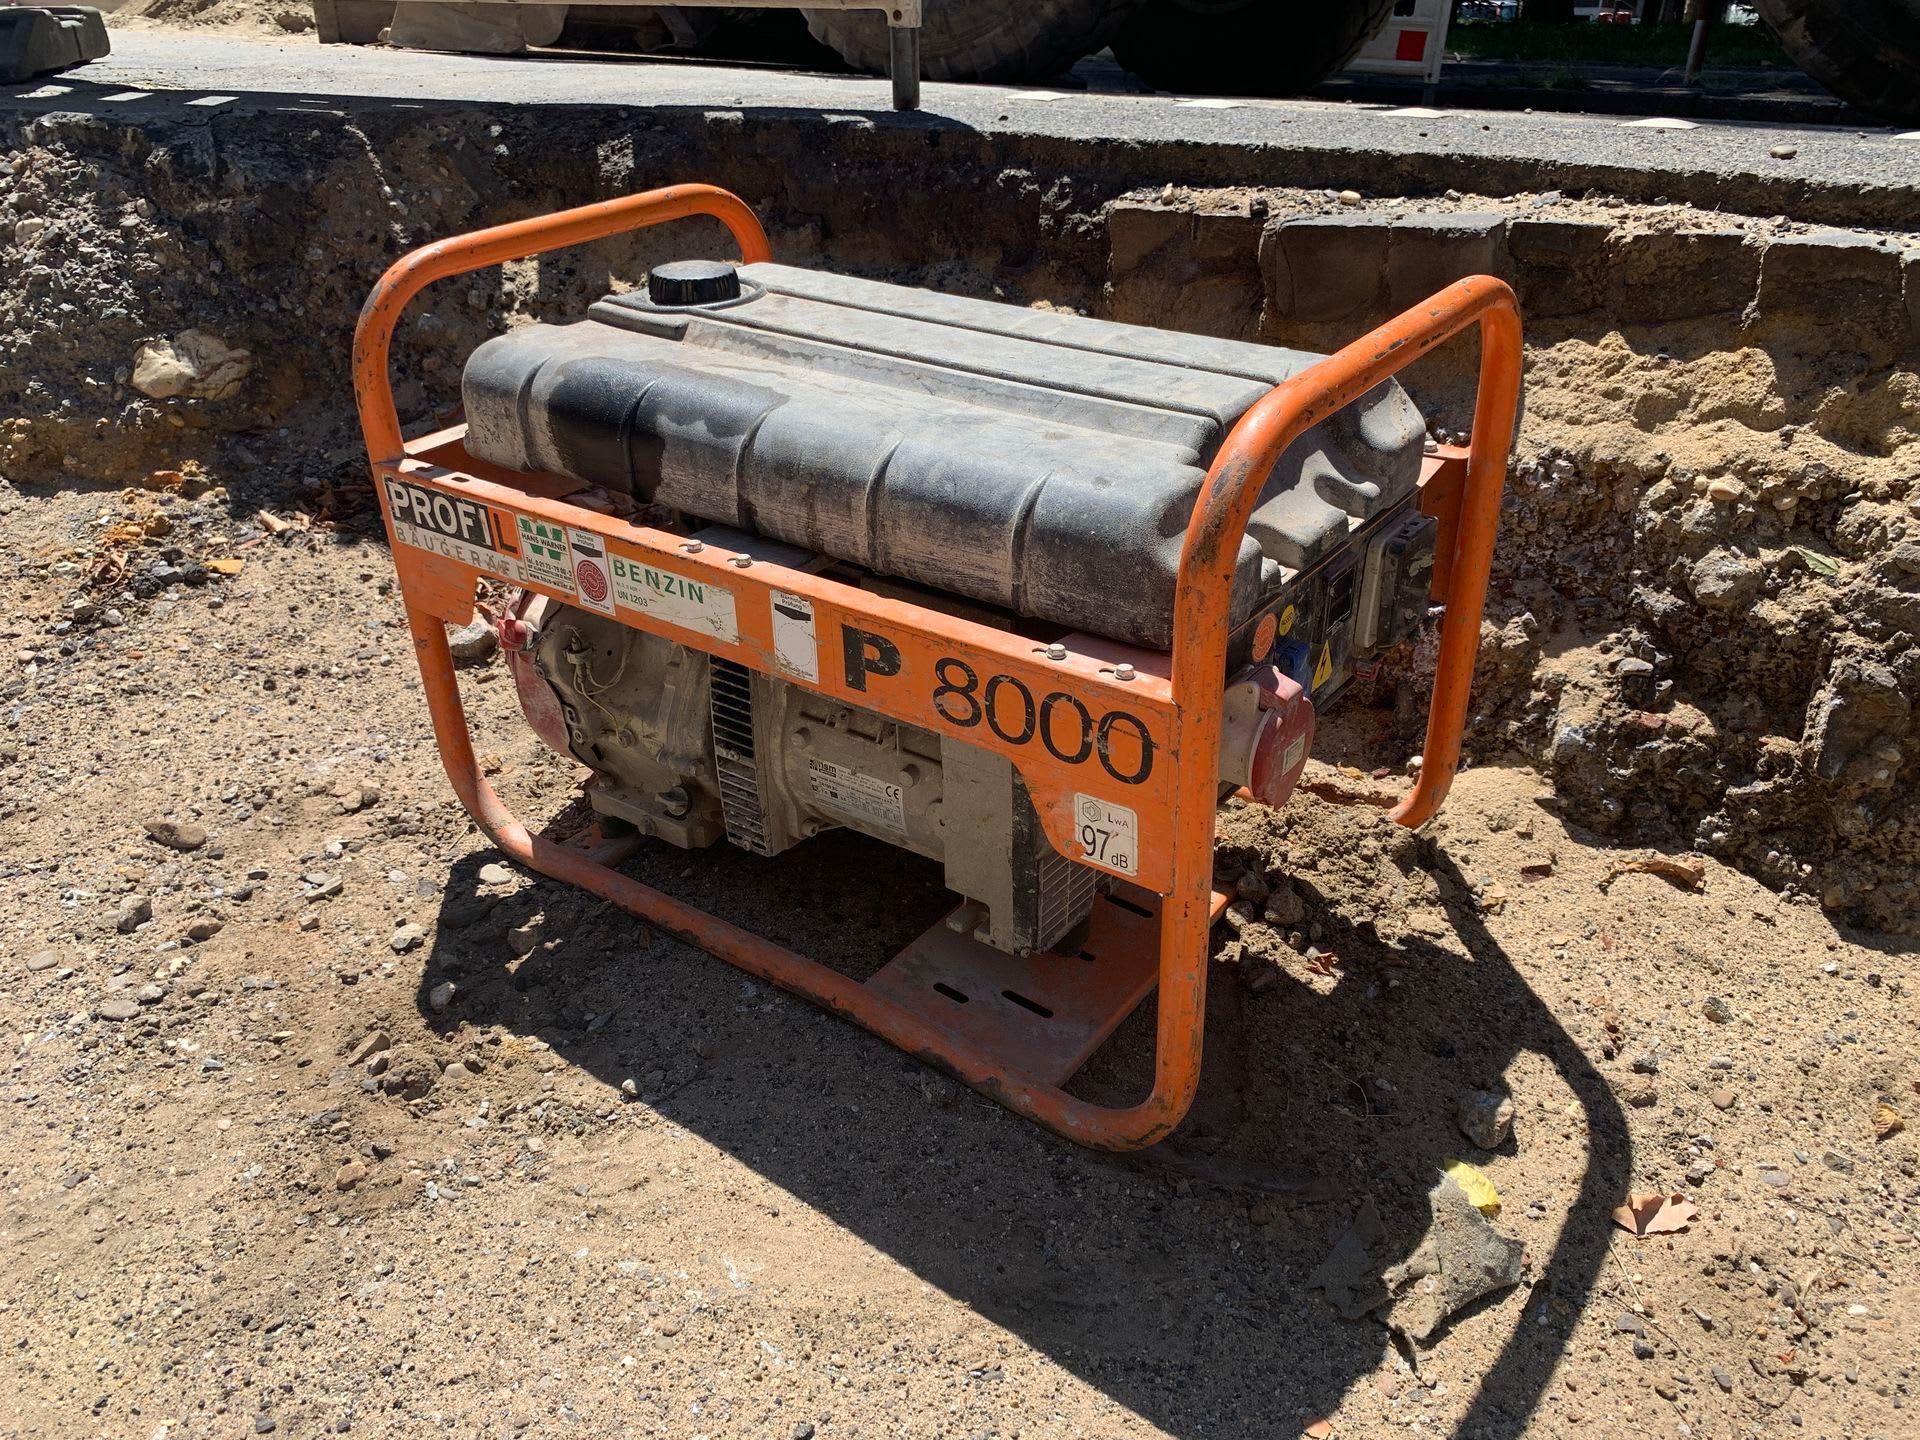 Stromerzeuger PROFIL P8000